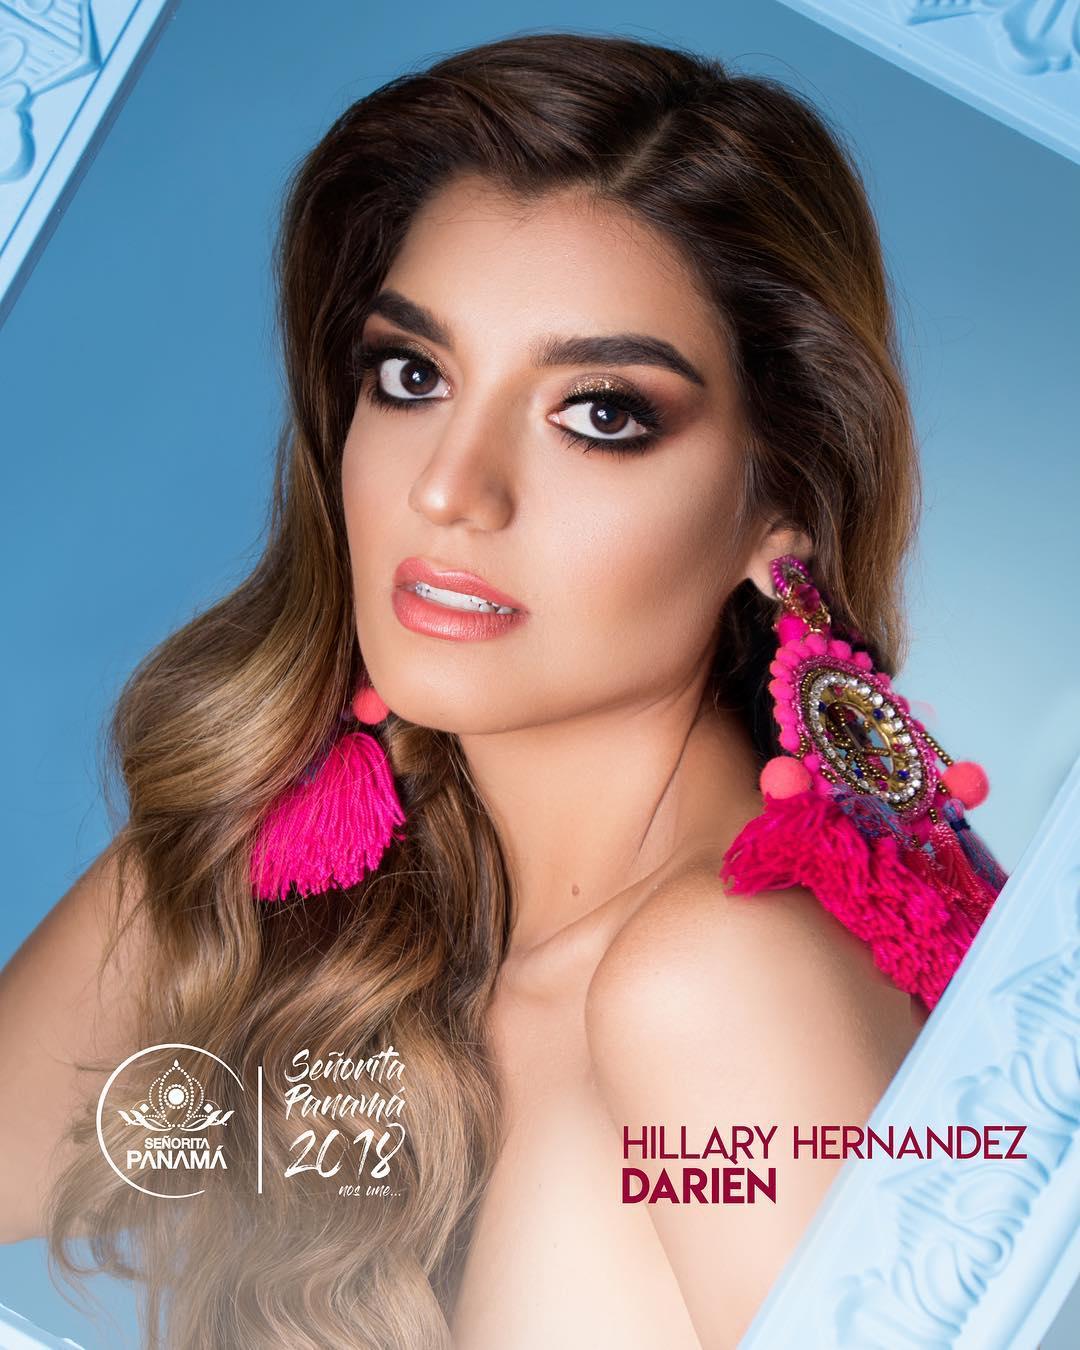 señorita miss colombia 2018 candidates candidatas contestants delegates Miss Darién Hillary Hernández